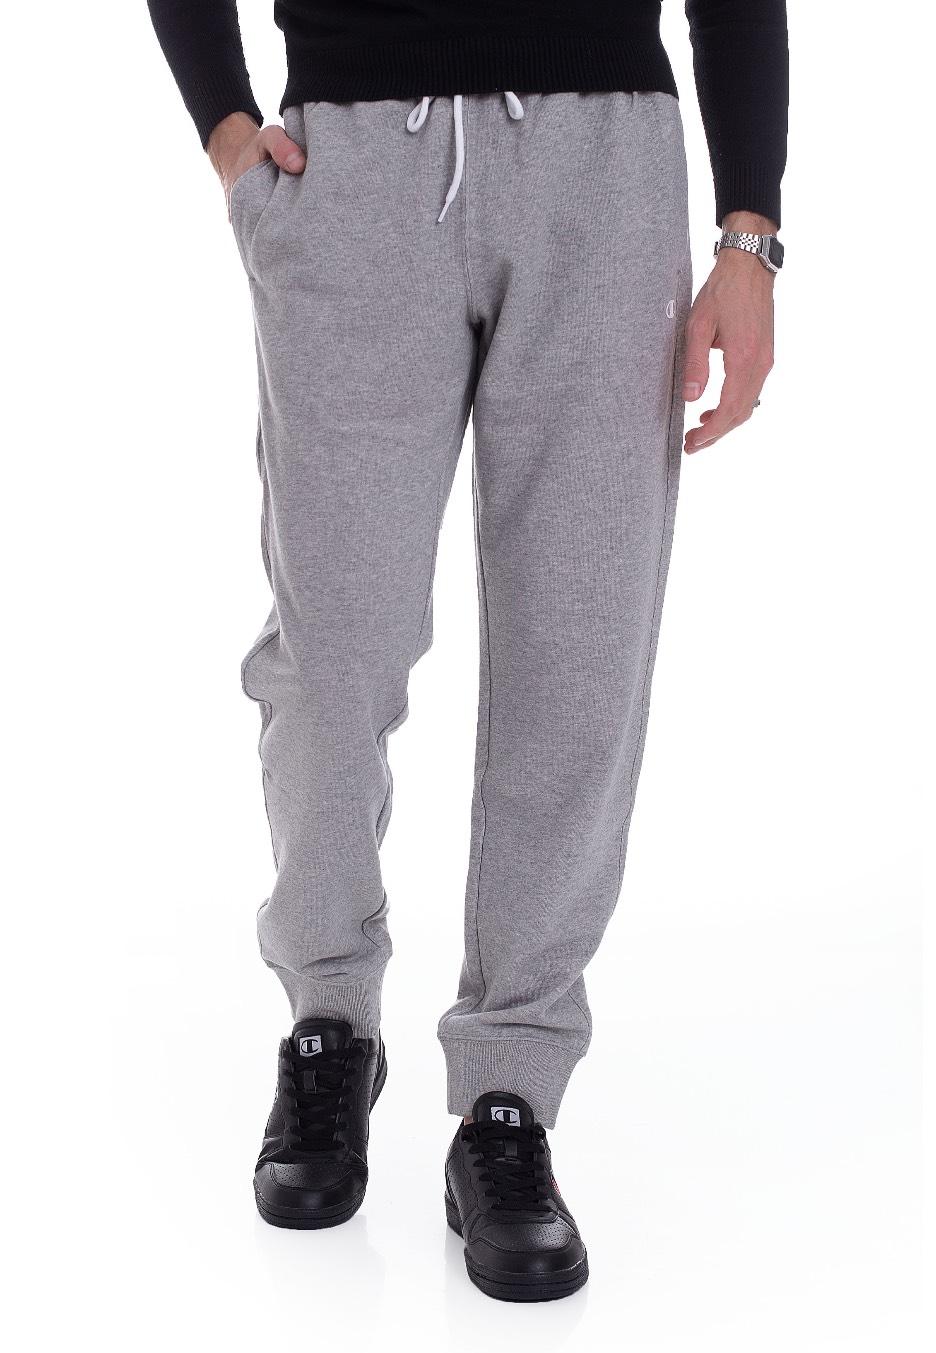 64d2beac8887 Champion - Rib Cuff OXGM - Sweat Pants - Streetwear Shop - Impericon.com AU